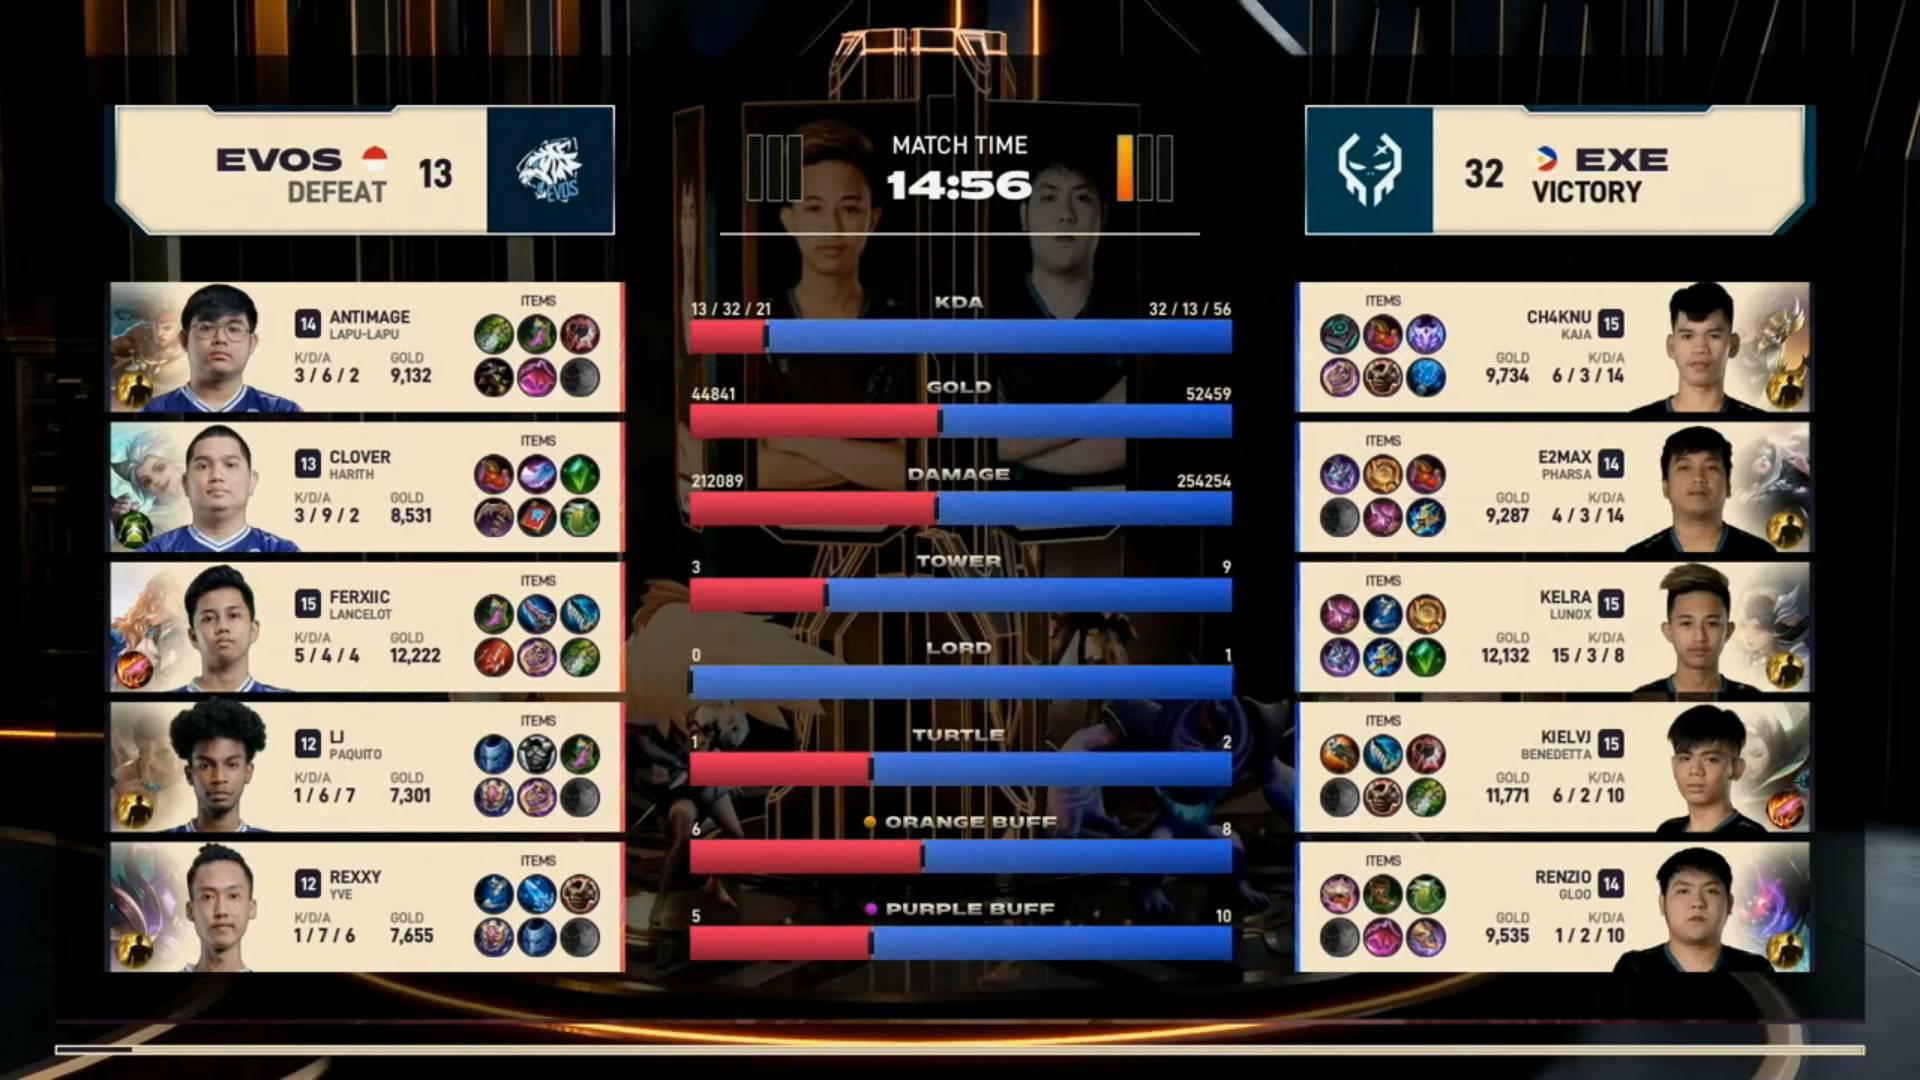 2021-MSC-Execration-def-EVOS-Legends-Game-1 Déjà Vu: Execration rises from lower bracket, sets up MSC showdown vs Blacklist ESports Mobile Legends MPL-PH News  - philippine sports news